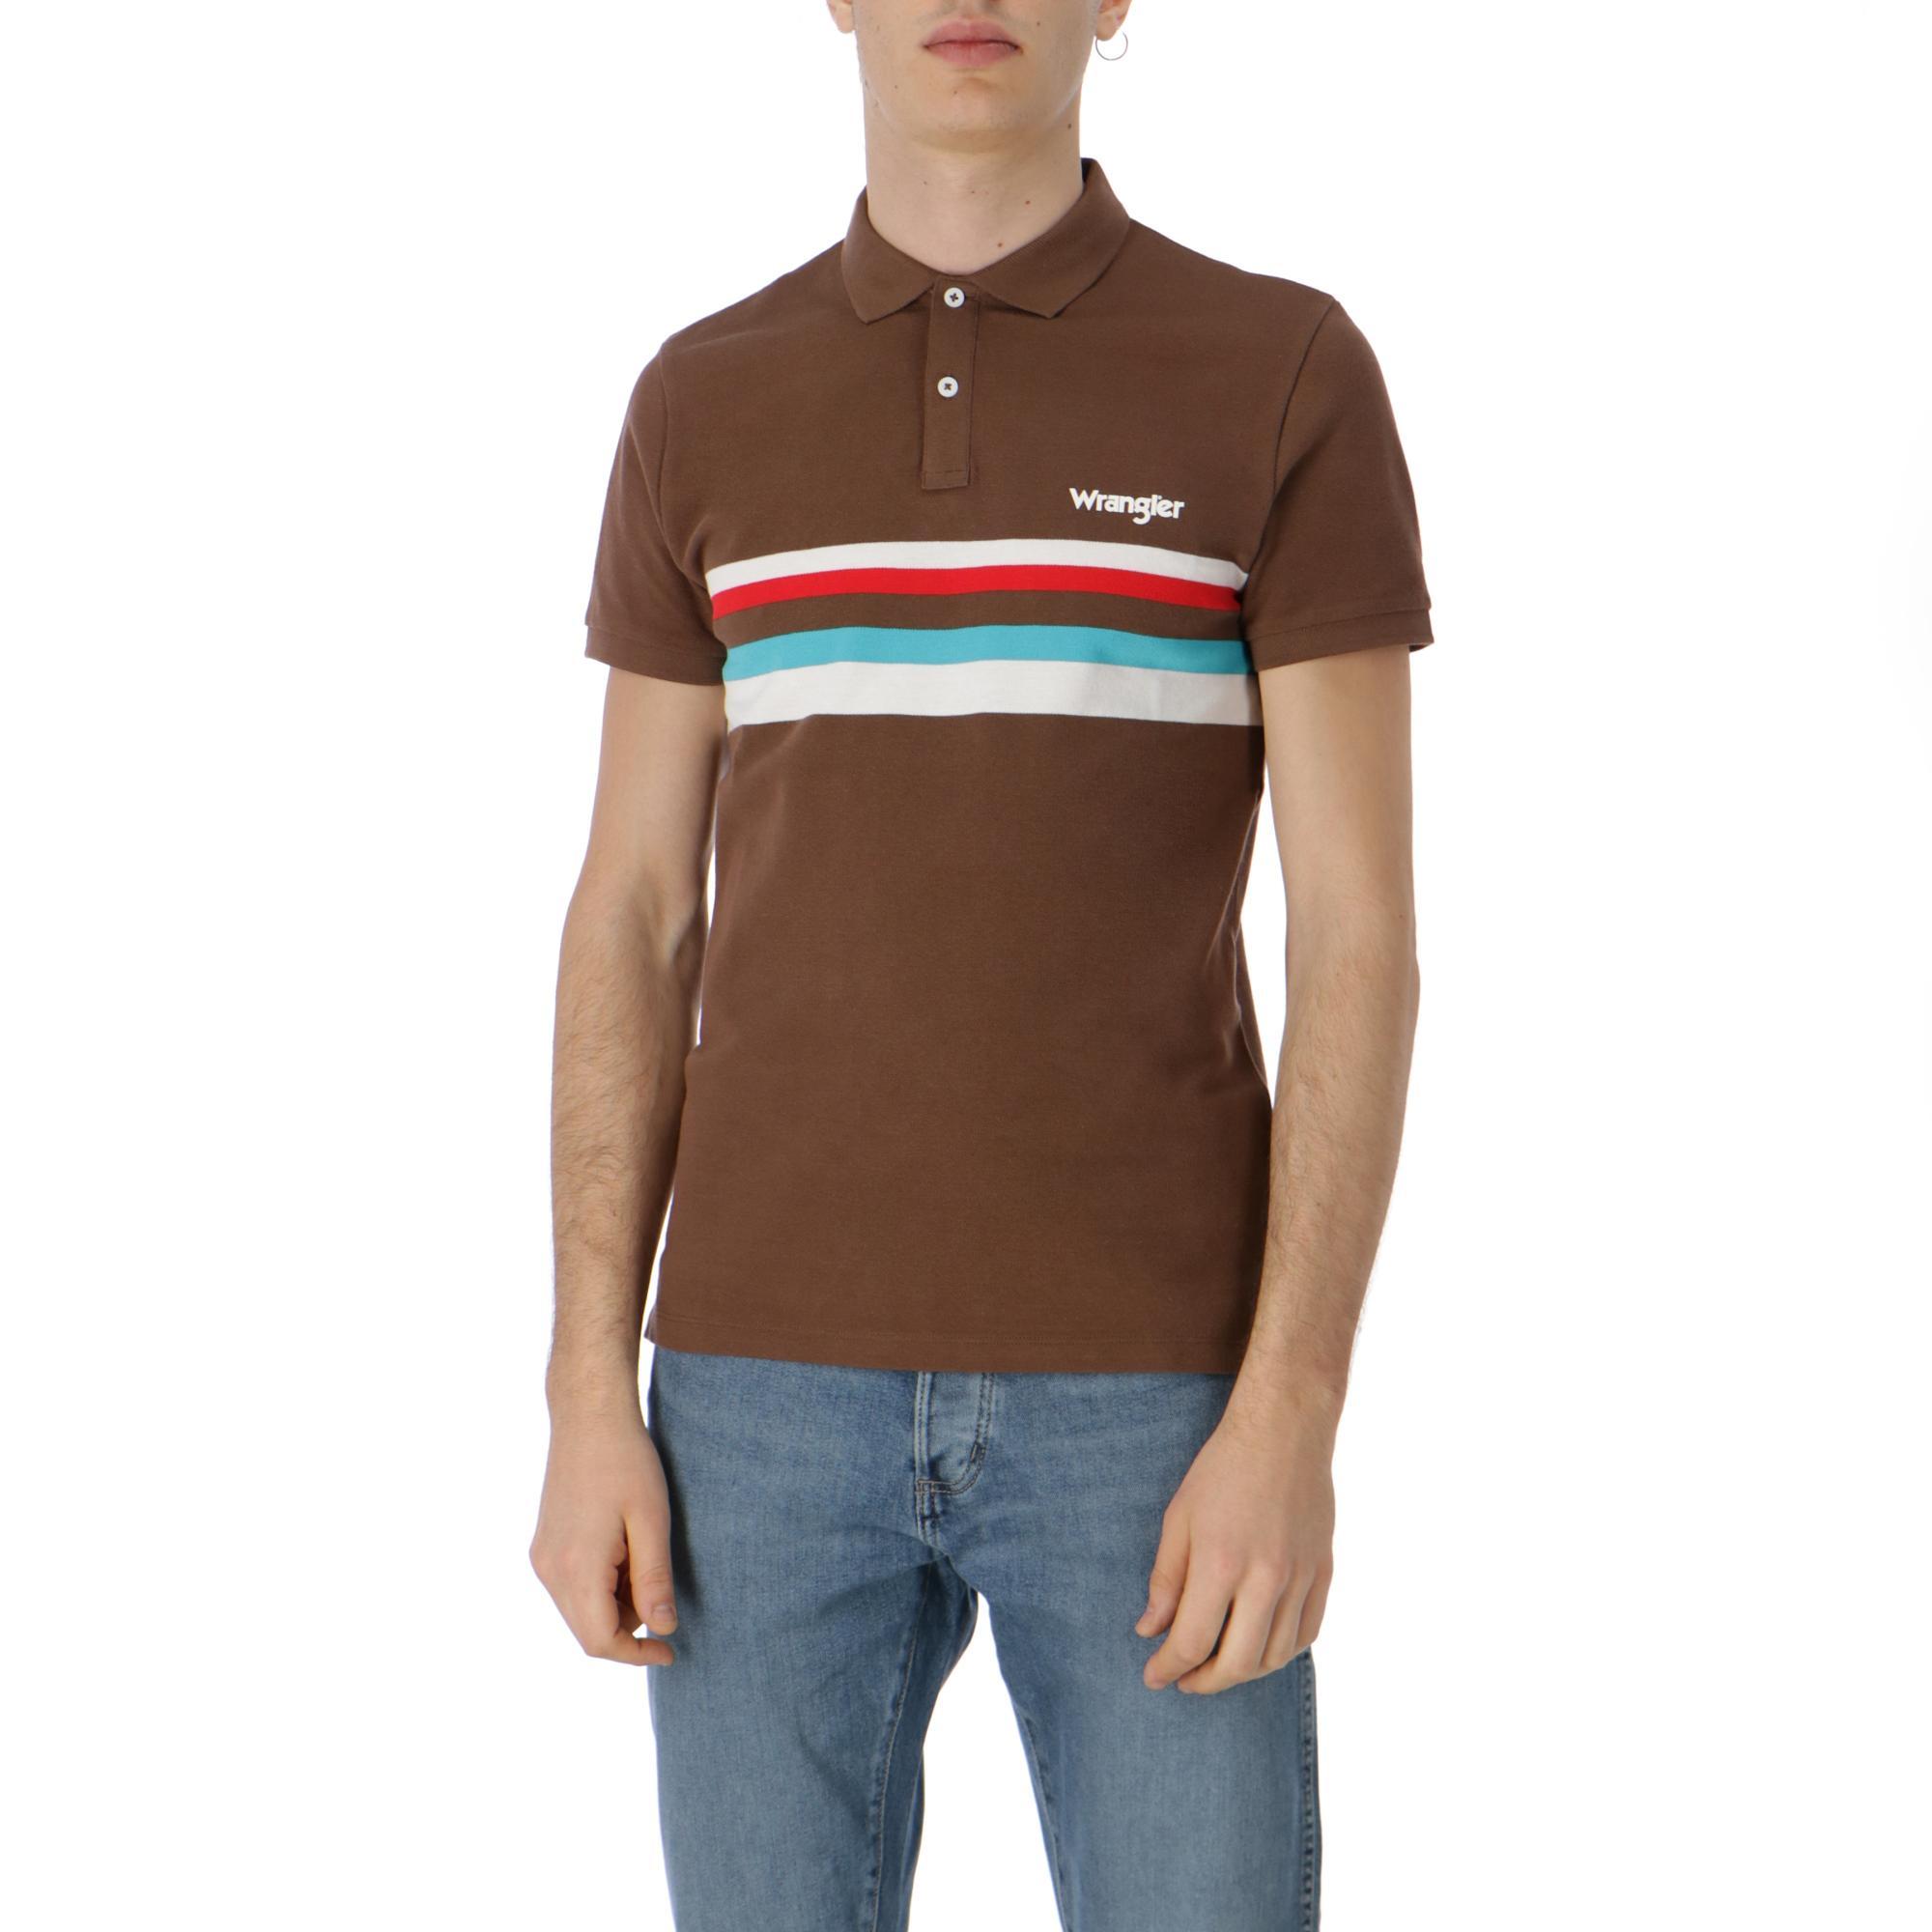 078b48a499b9 Wrangler Band Stripe Polo Pinecone | Treesse